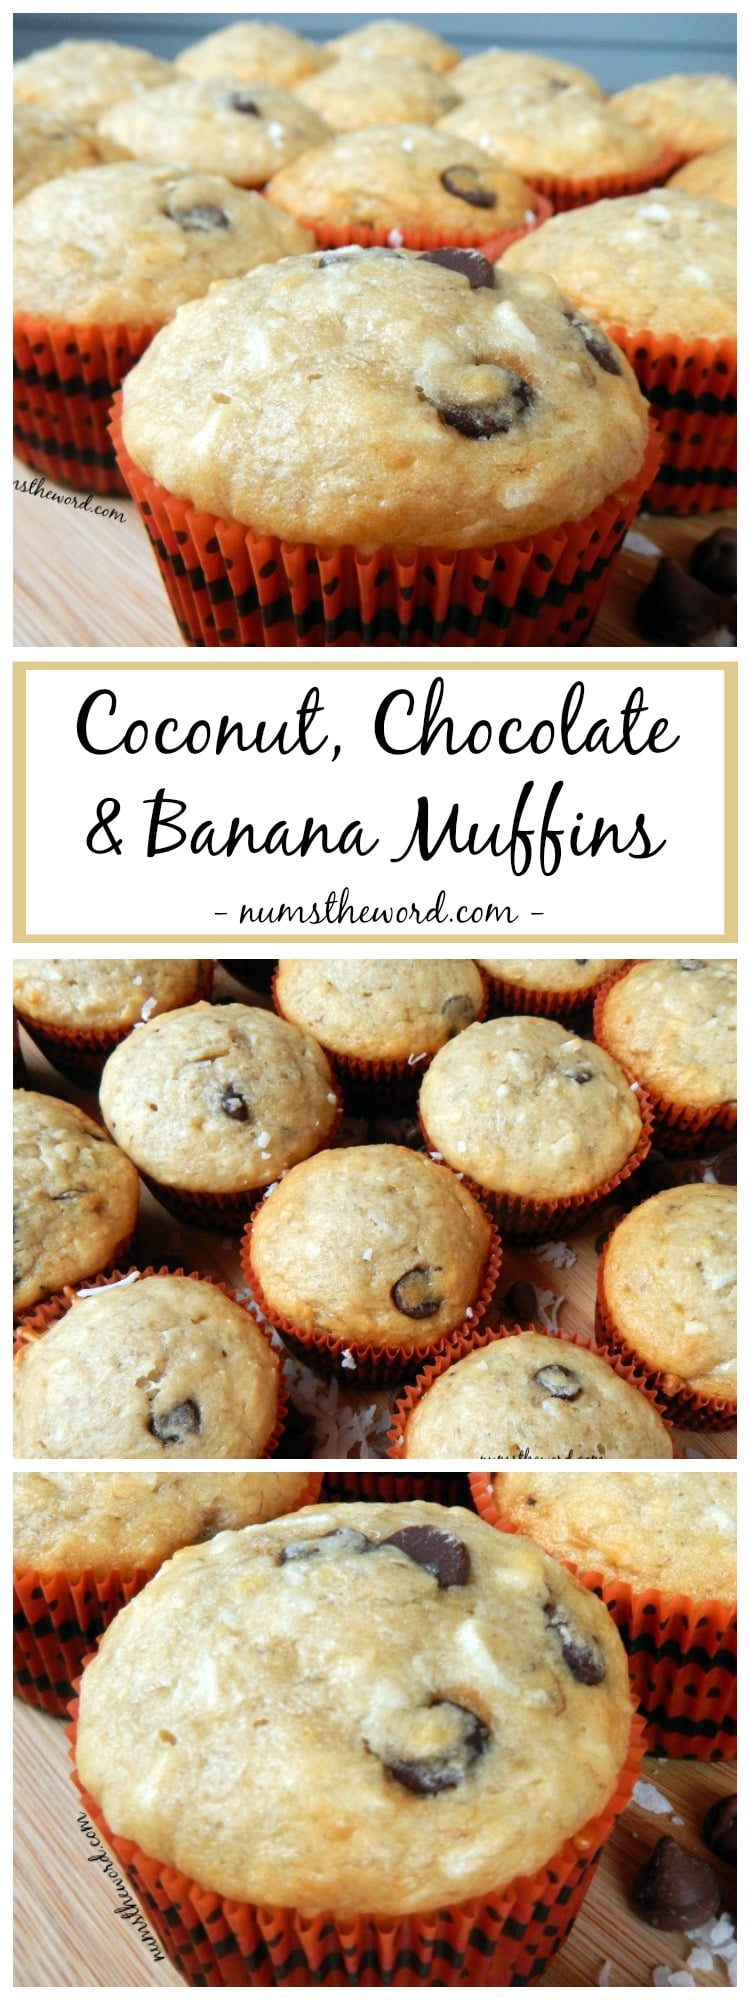 Coconut, Chocolate & Banana Muffins